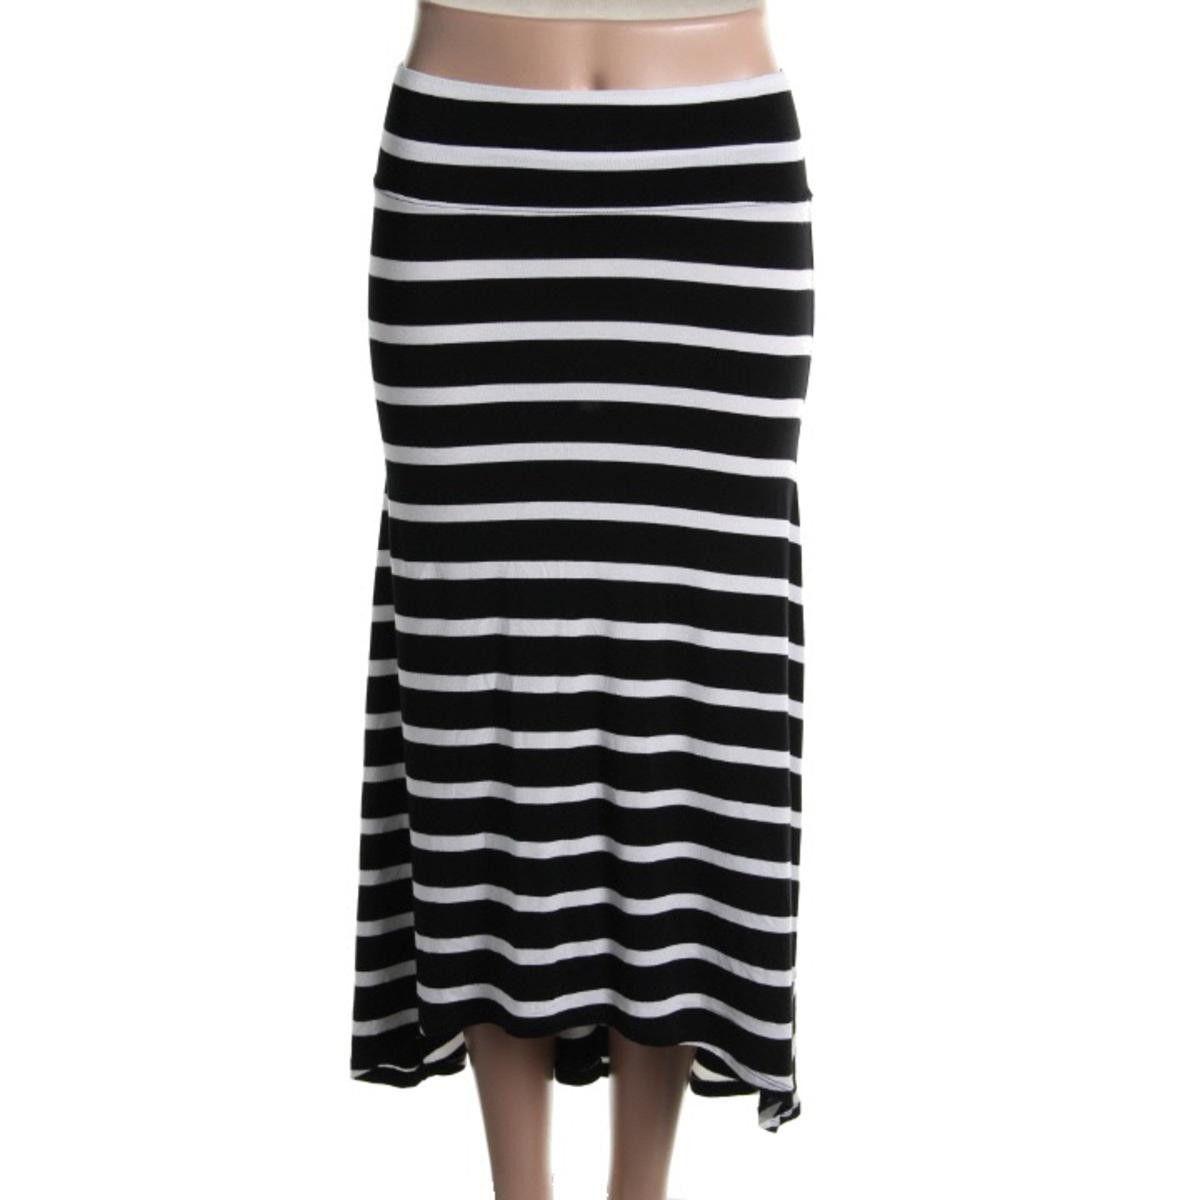 Erik + Lani Womens Juniors Jersey Hi-Low A-Line Skirt